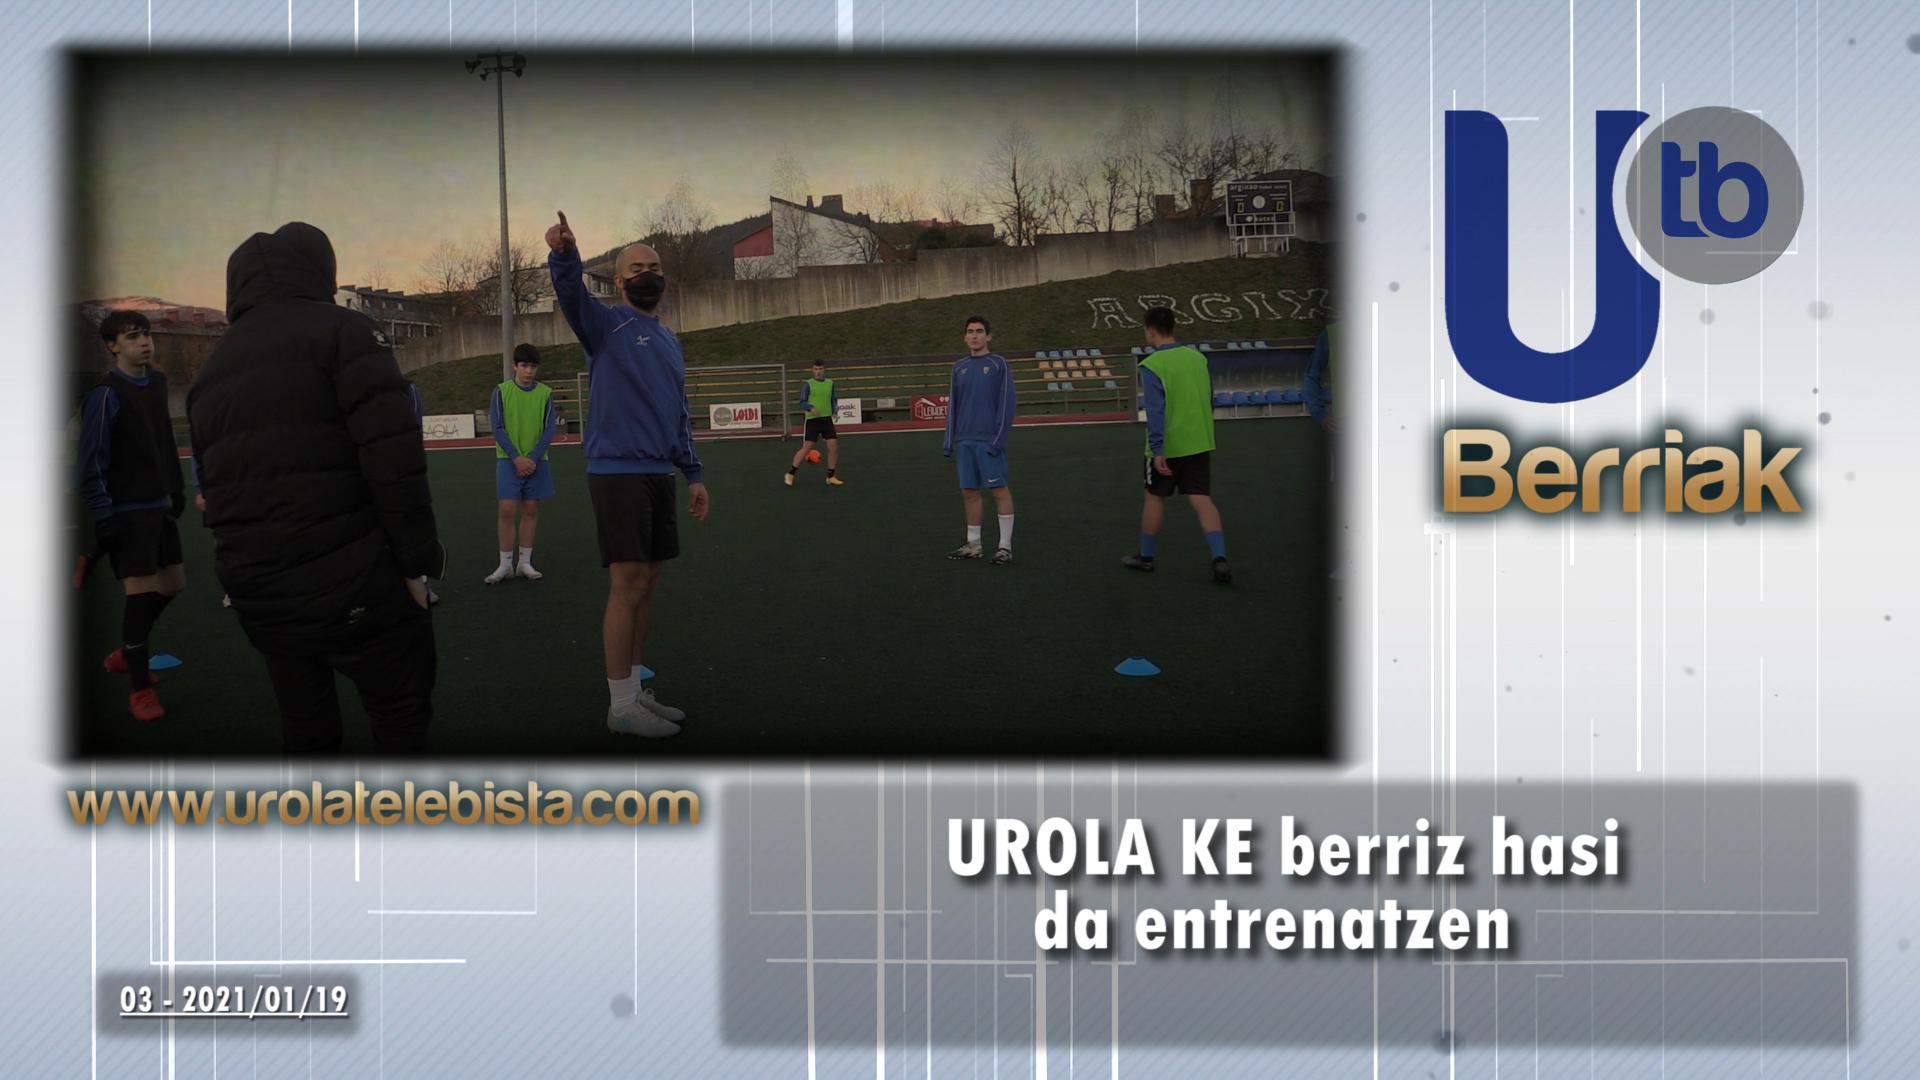 UROLA KE berriz hasi da entrenatzen / SD UROLA retoma los entrenamientos